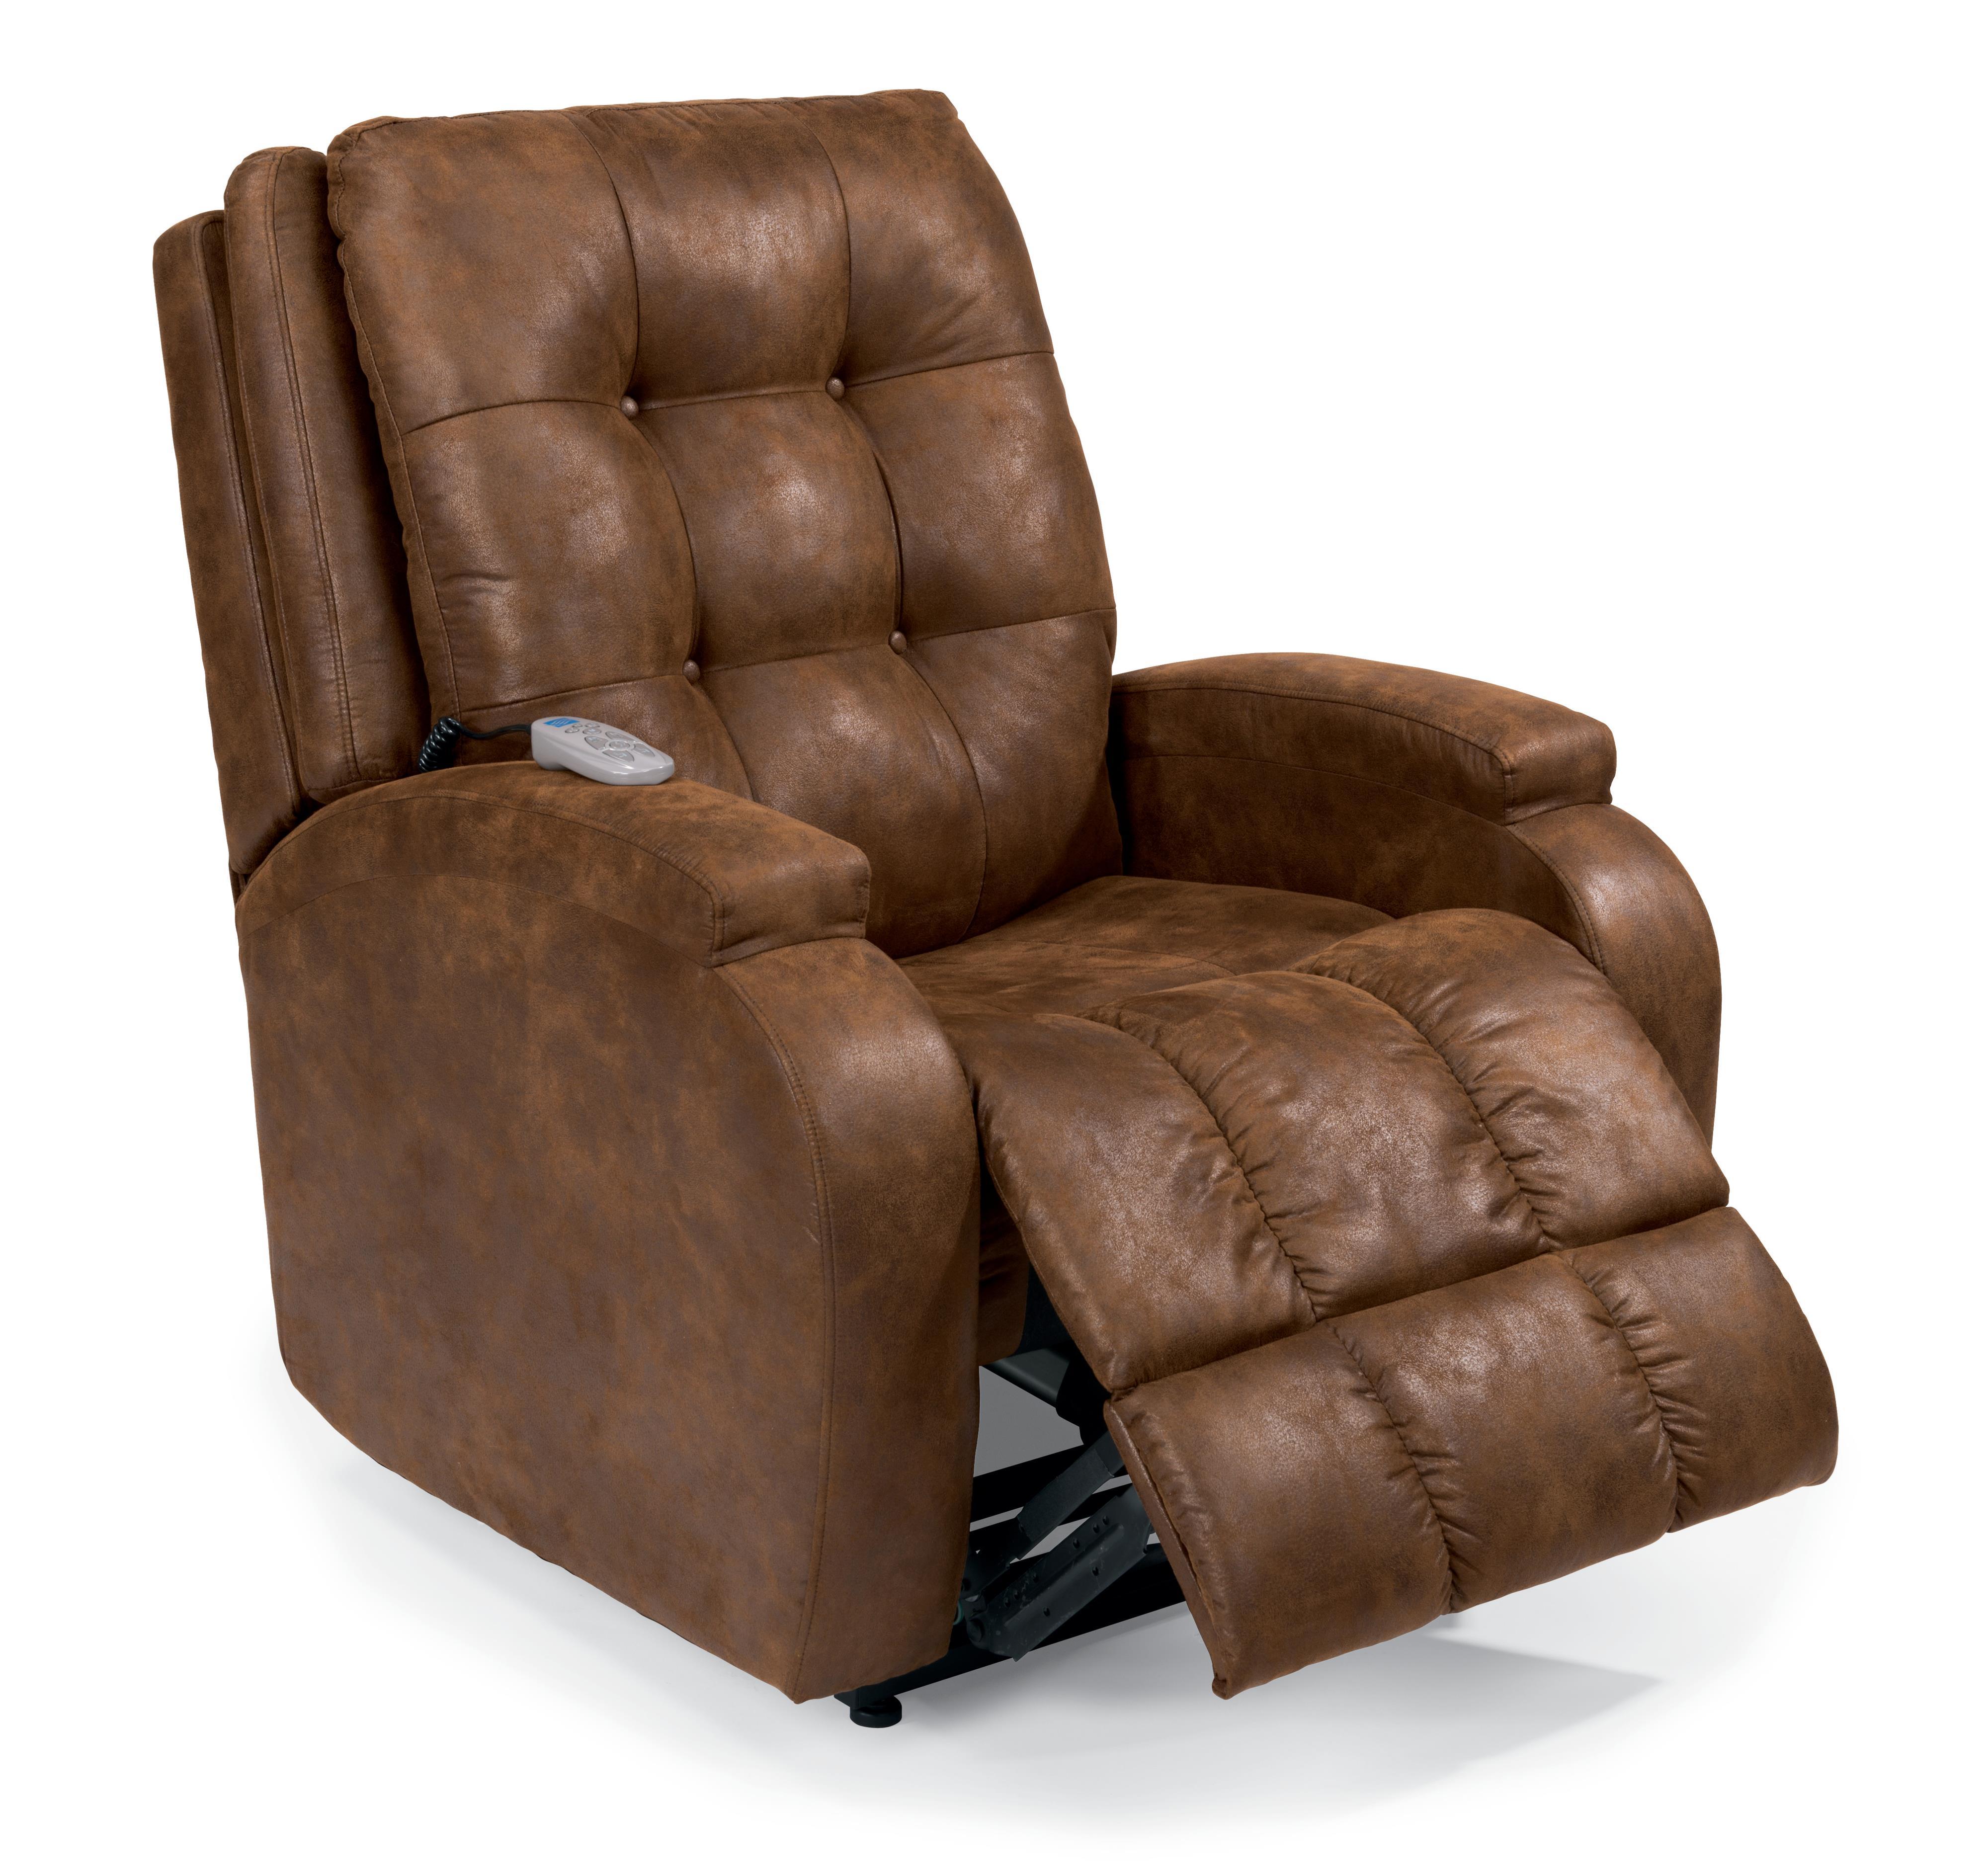 Flexsteel Latitudes Lift Chairs Orion Infinite-Position Lift Recliner - Item Number: 1903-55-745-54